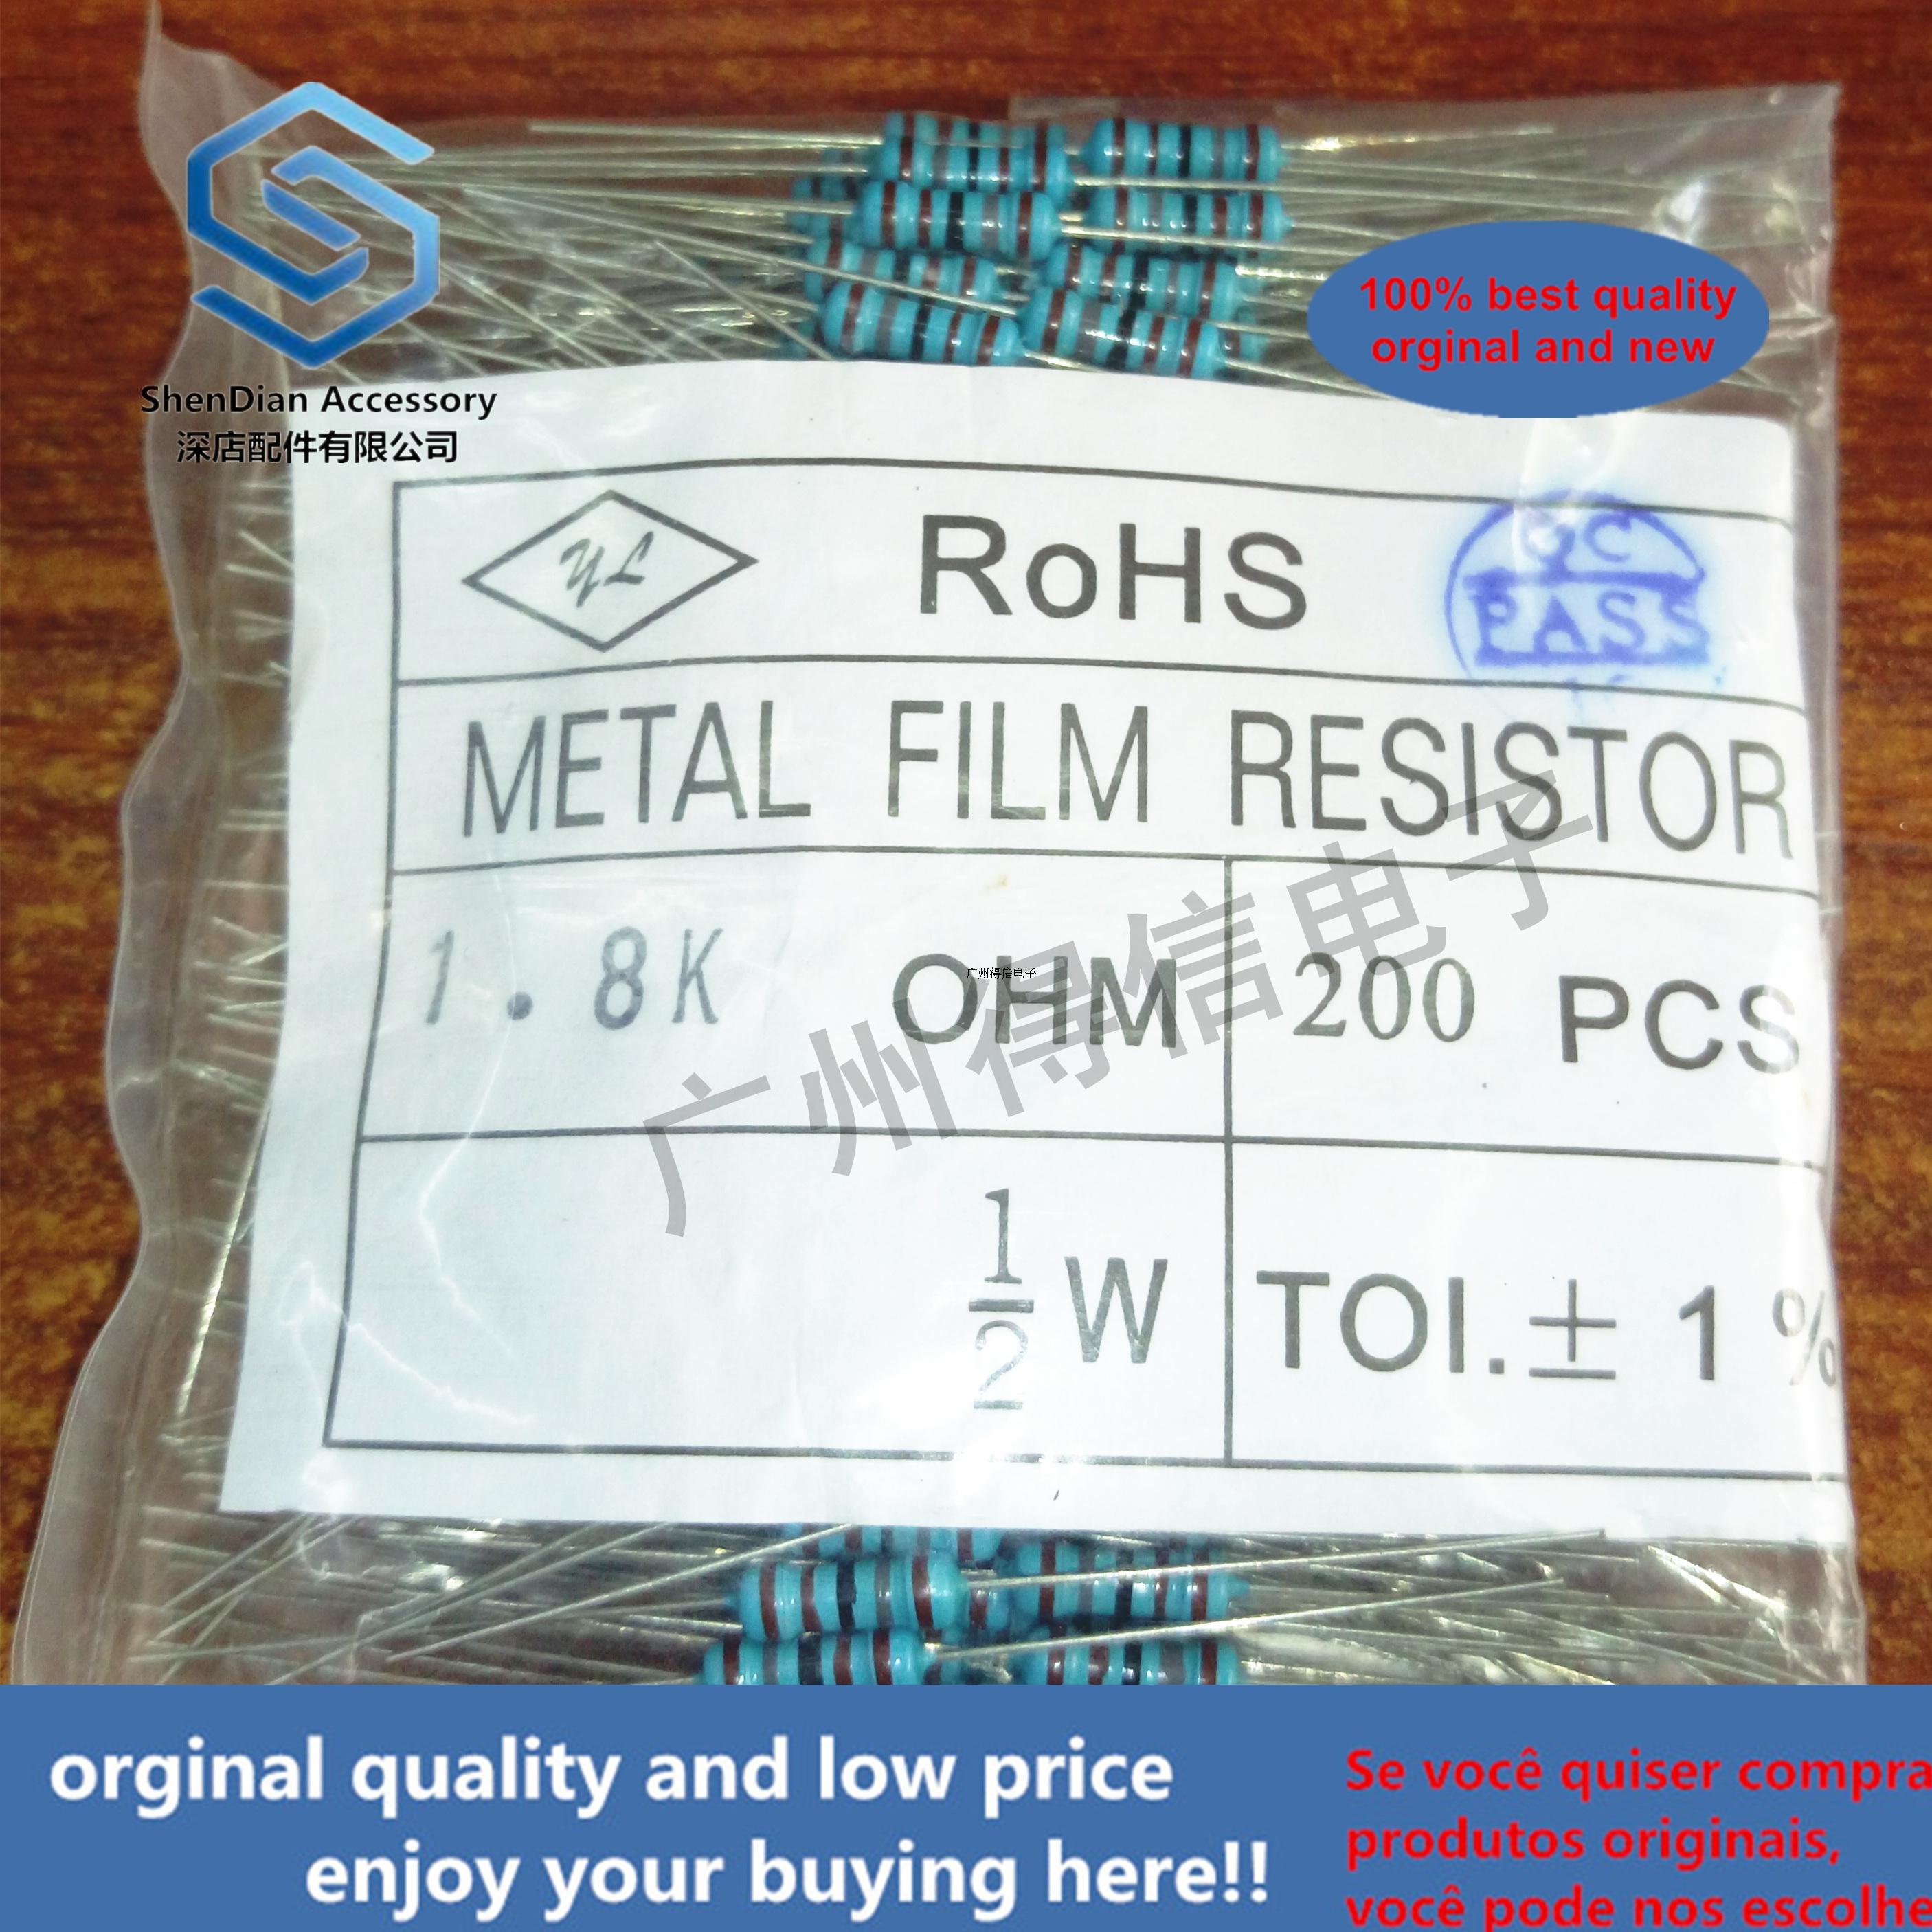 200pcs 1 / 2W 1.2R 1.2 Euro 1% Brand New Metal Film Iron Feet Resistor Bag 200 Pcs Per Pack